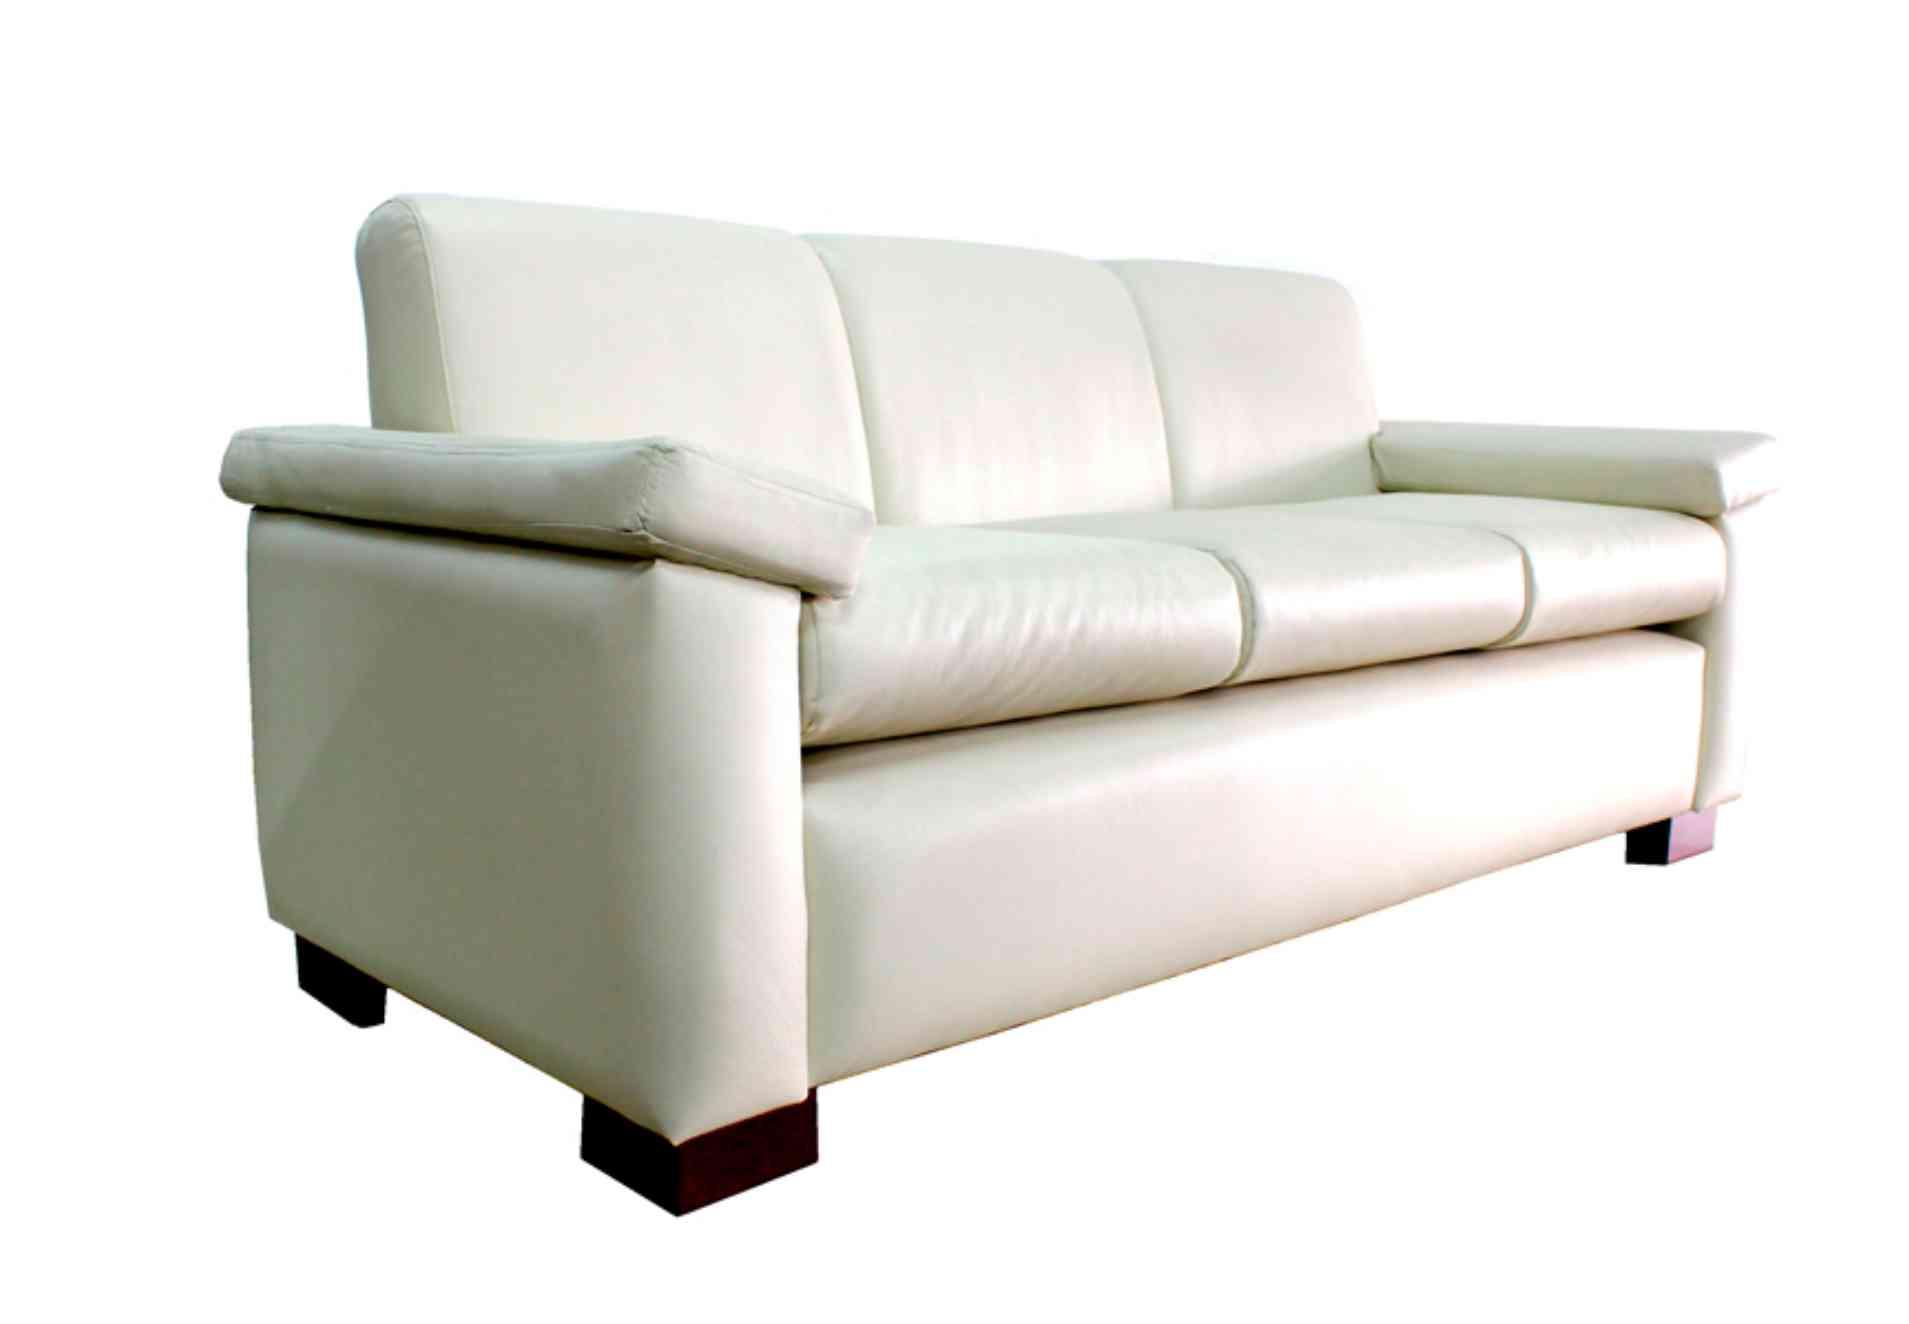 Sofa Muebles el Cid 1804